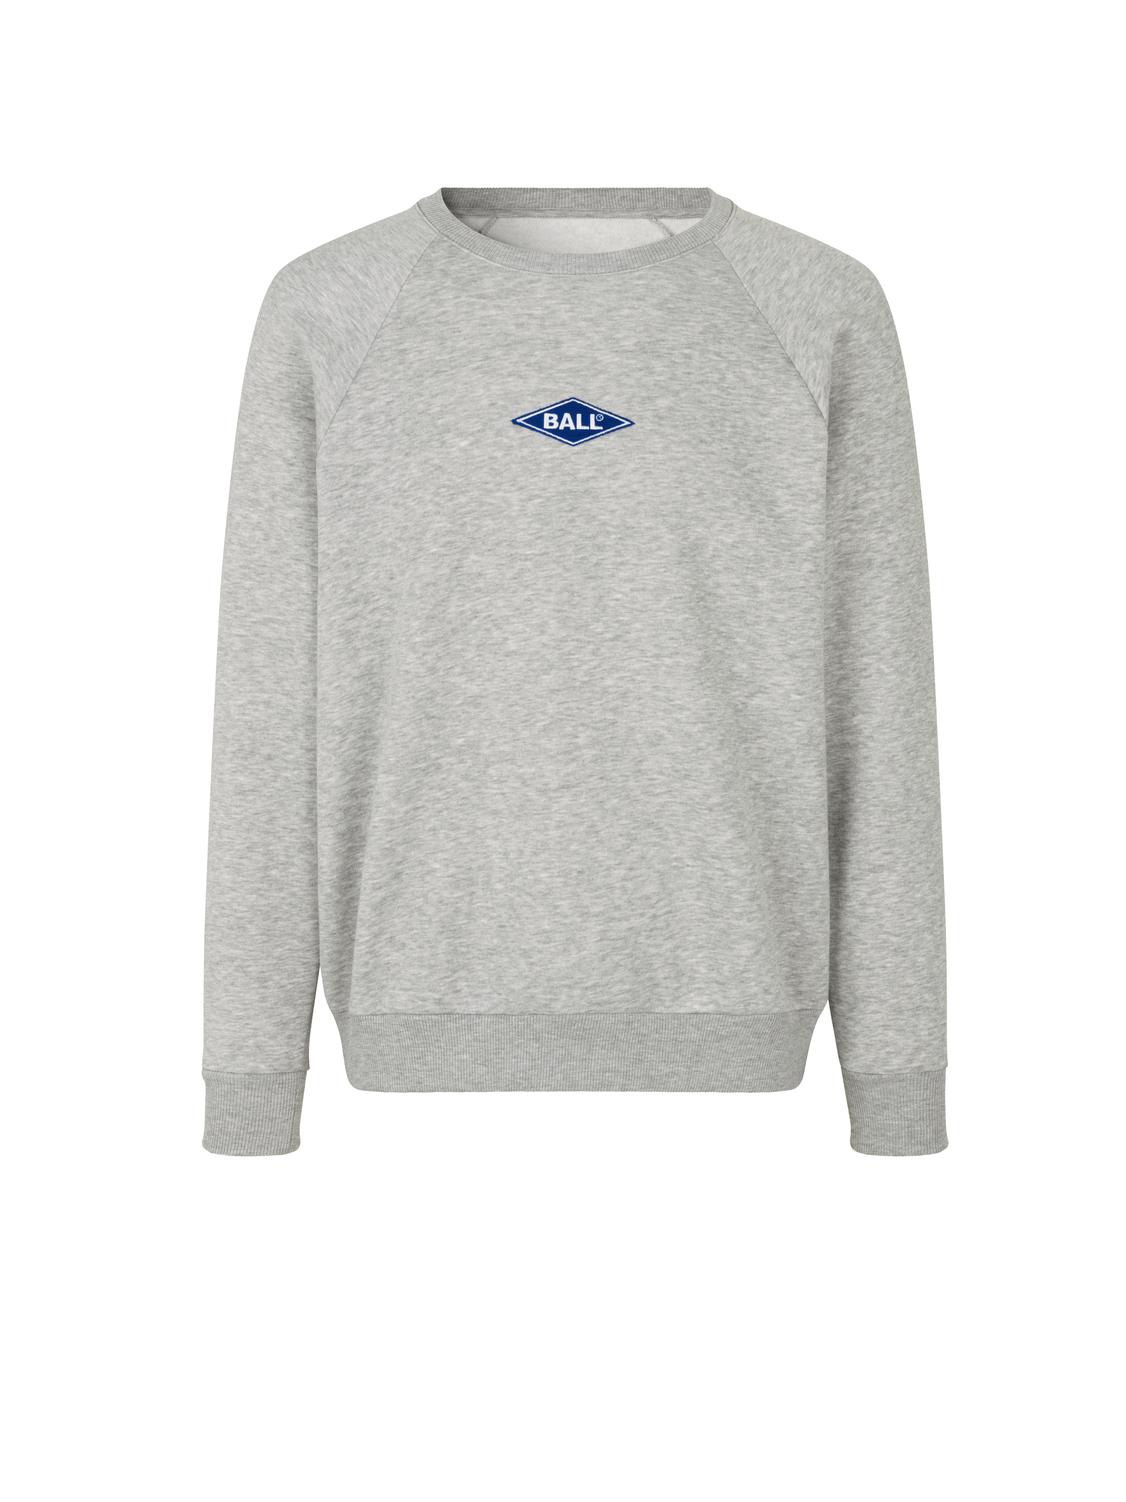 BALL Original Raglan Crew Neck sweatshirt, light grey melange, large